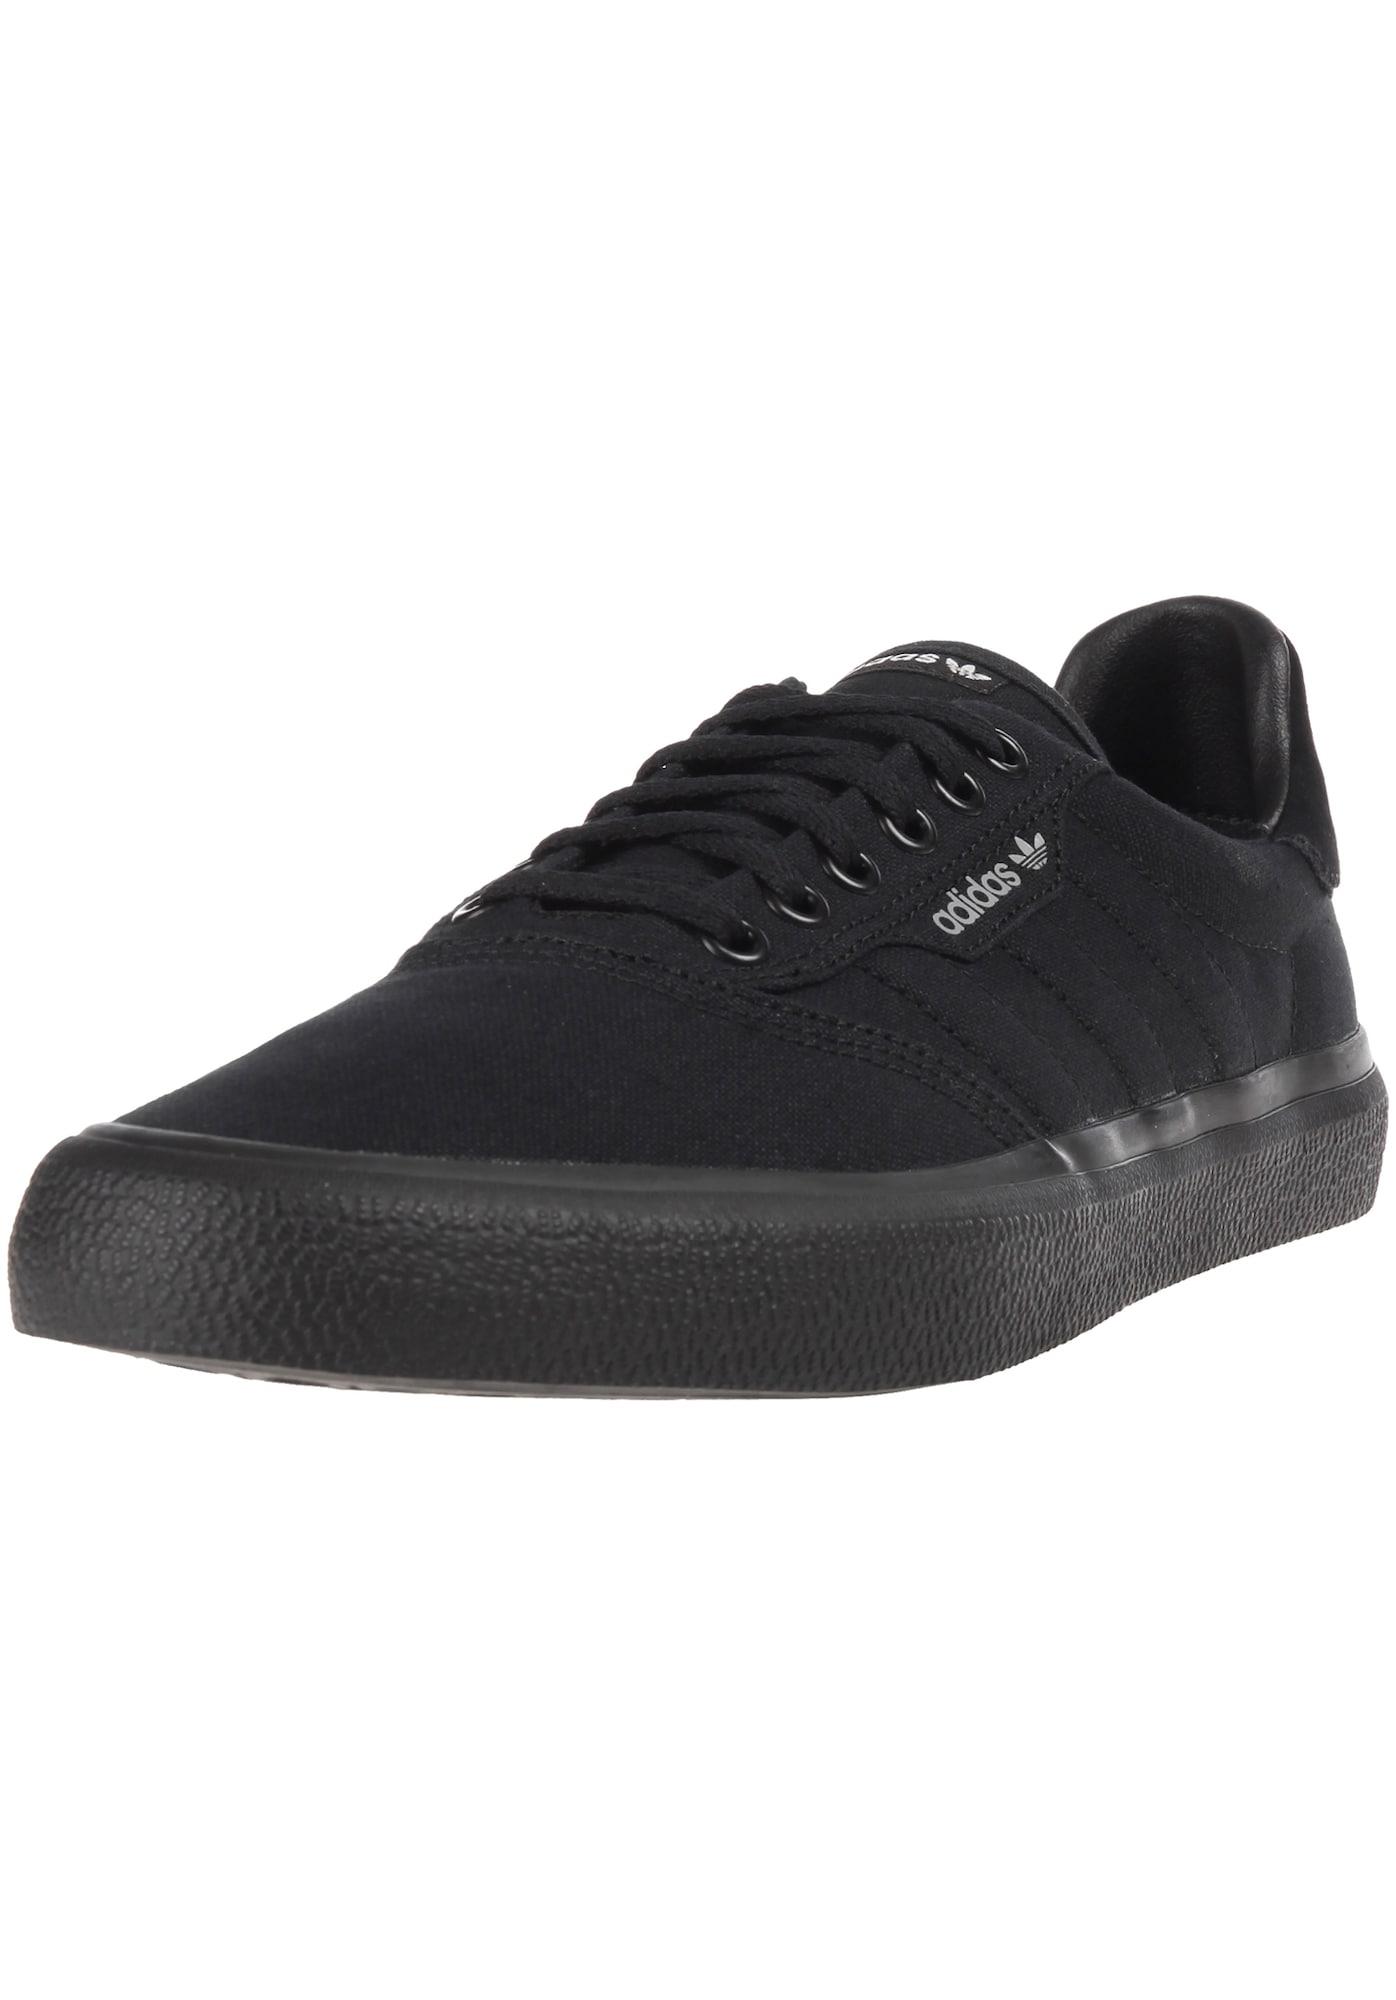 ADIDAS ORIGINALS, Dames Sneakers laag '3MC', zwart